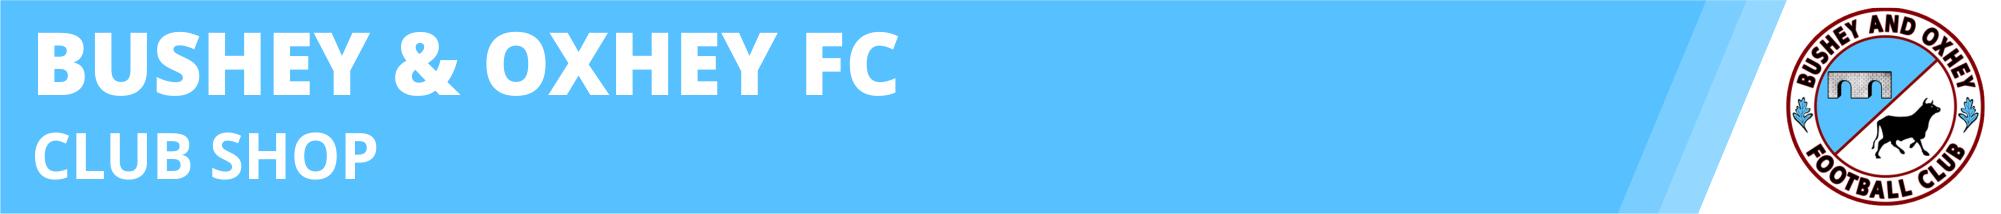 bushey-oxhey-fc-club-shop-banner.png